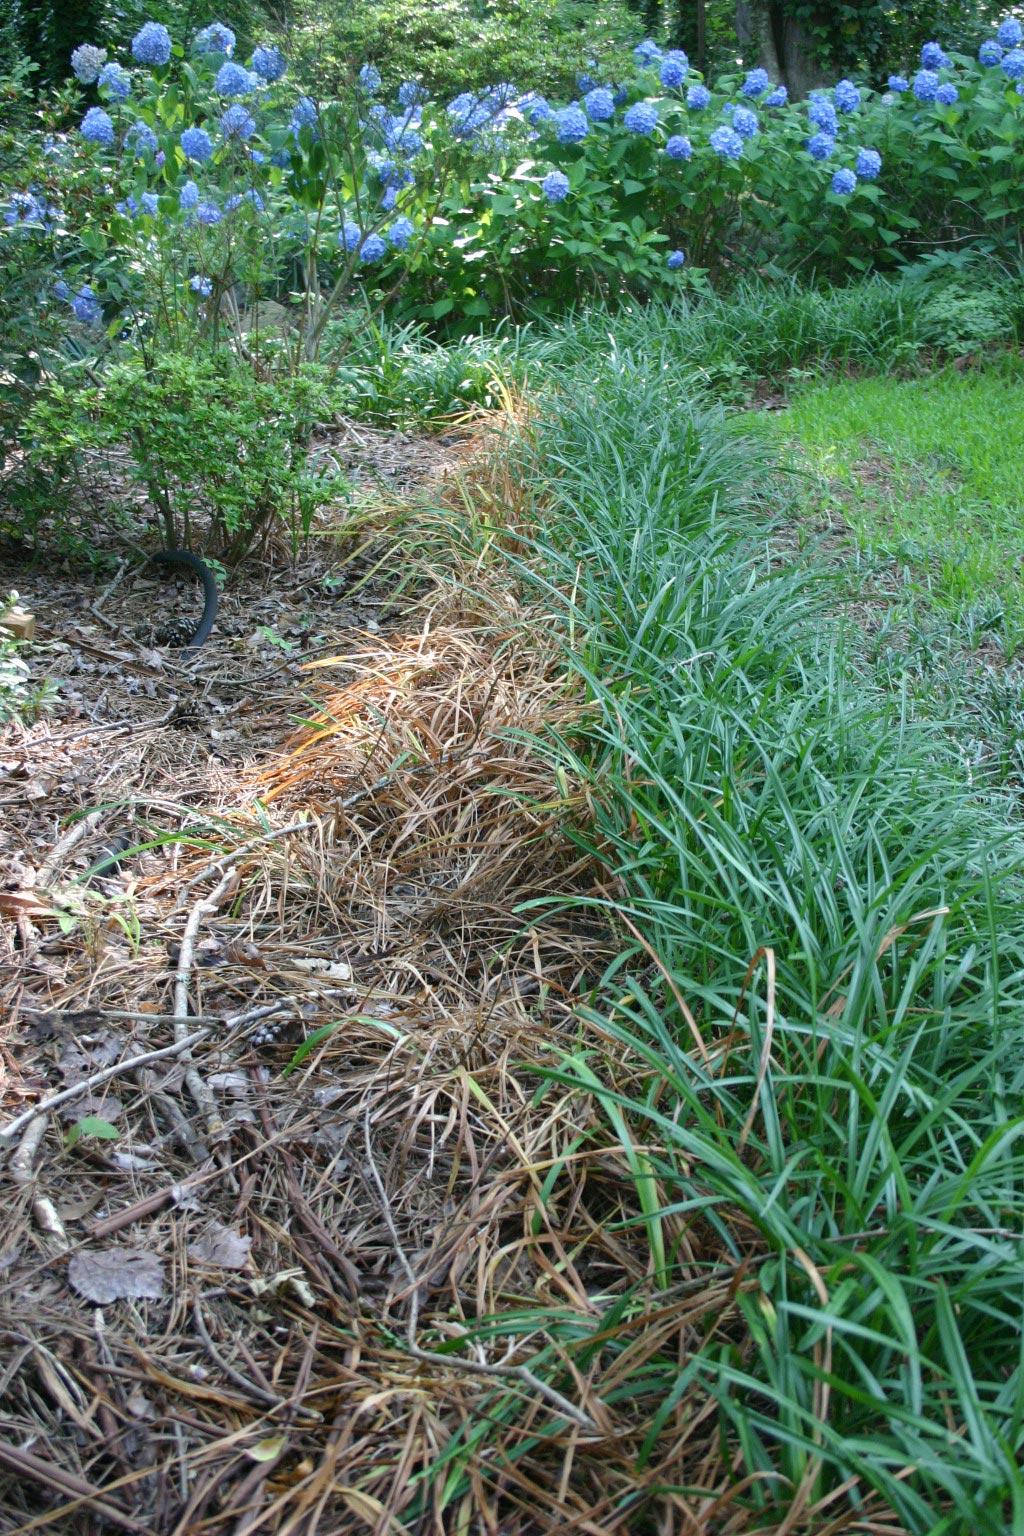 liriope strip dead 10 days after spraying glyphosate